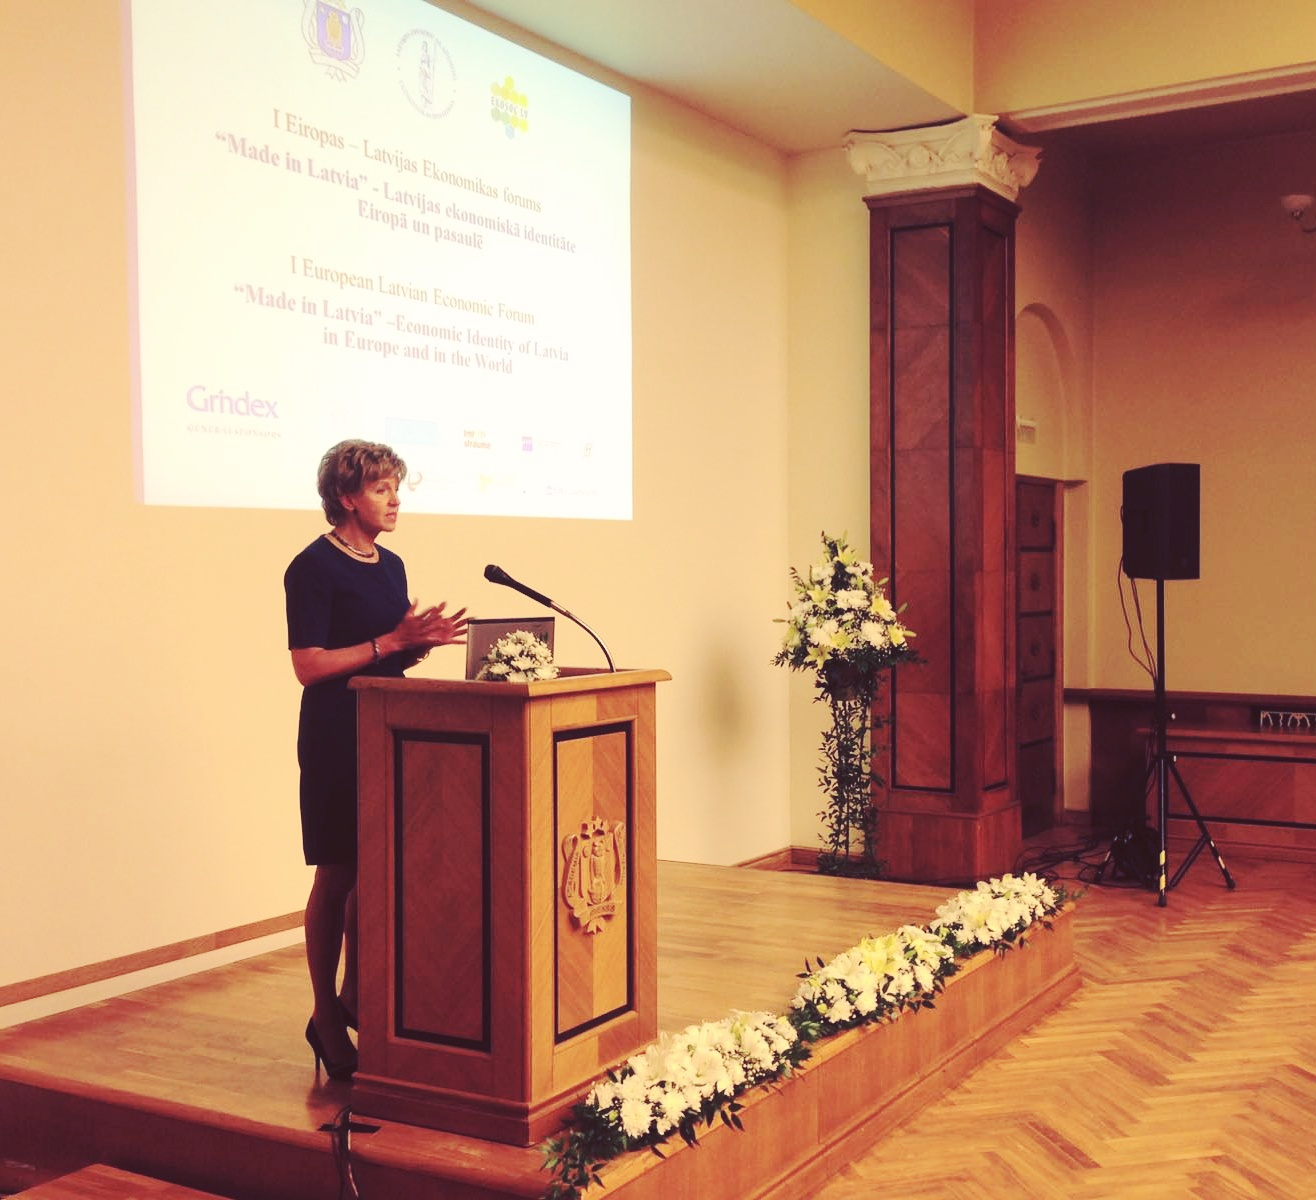 Eiropas – Latvijas Ekonomikas foruma atklāšana